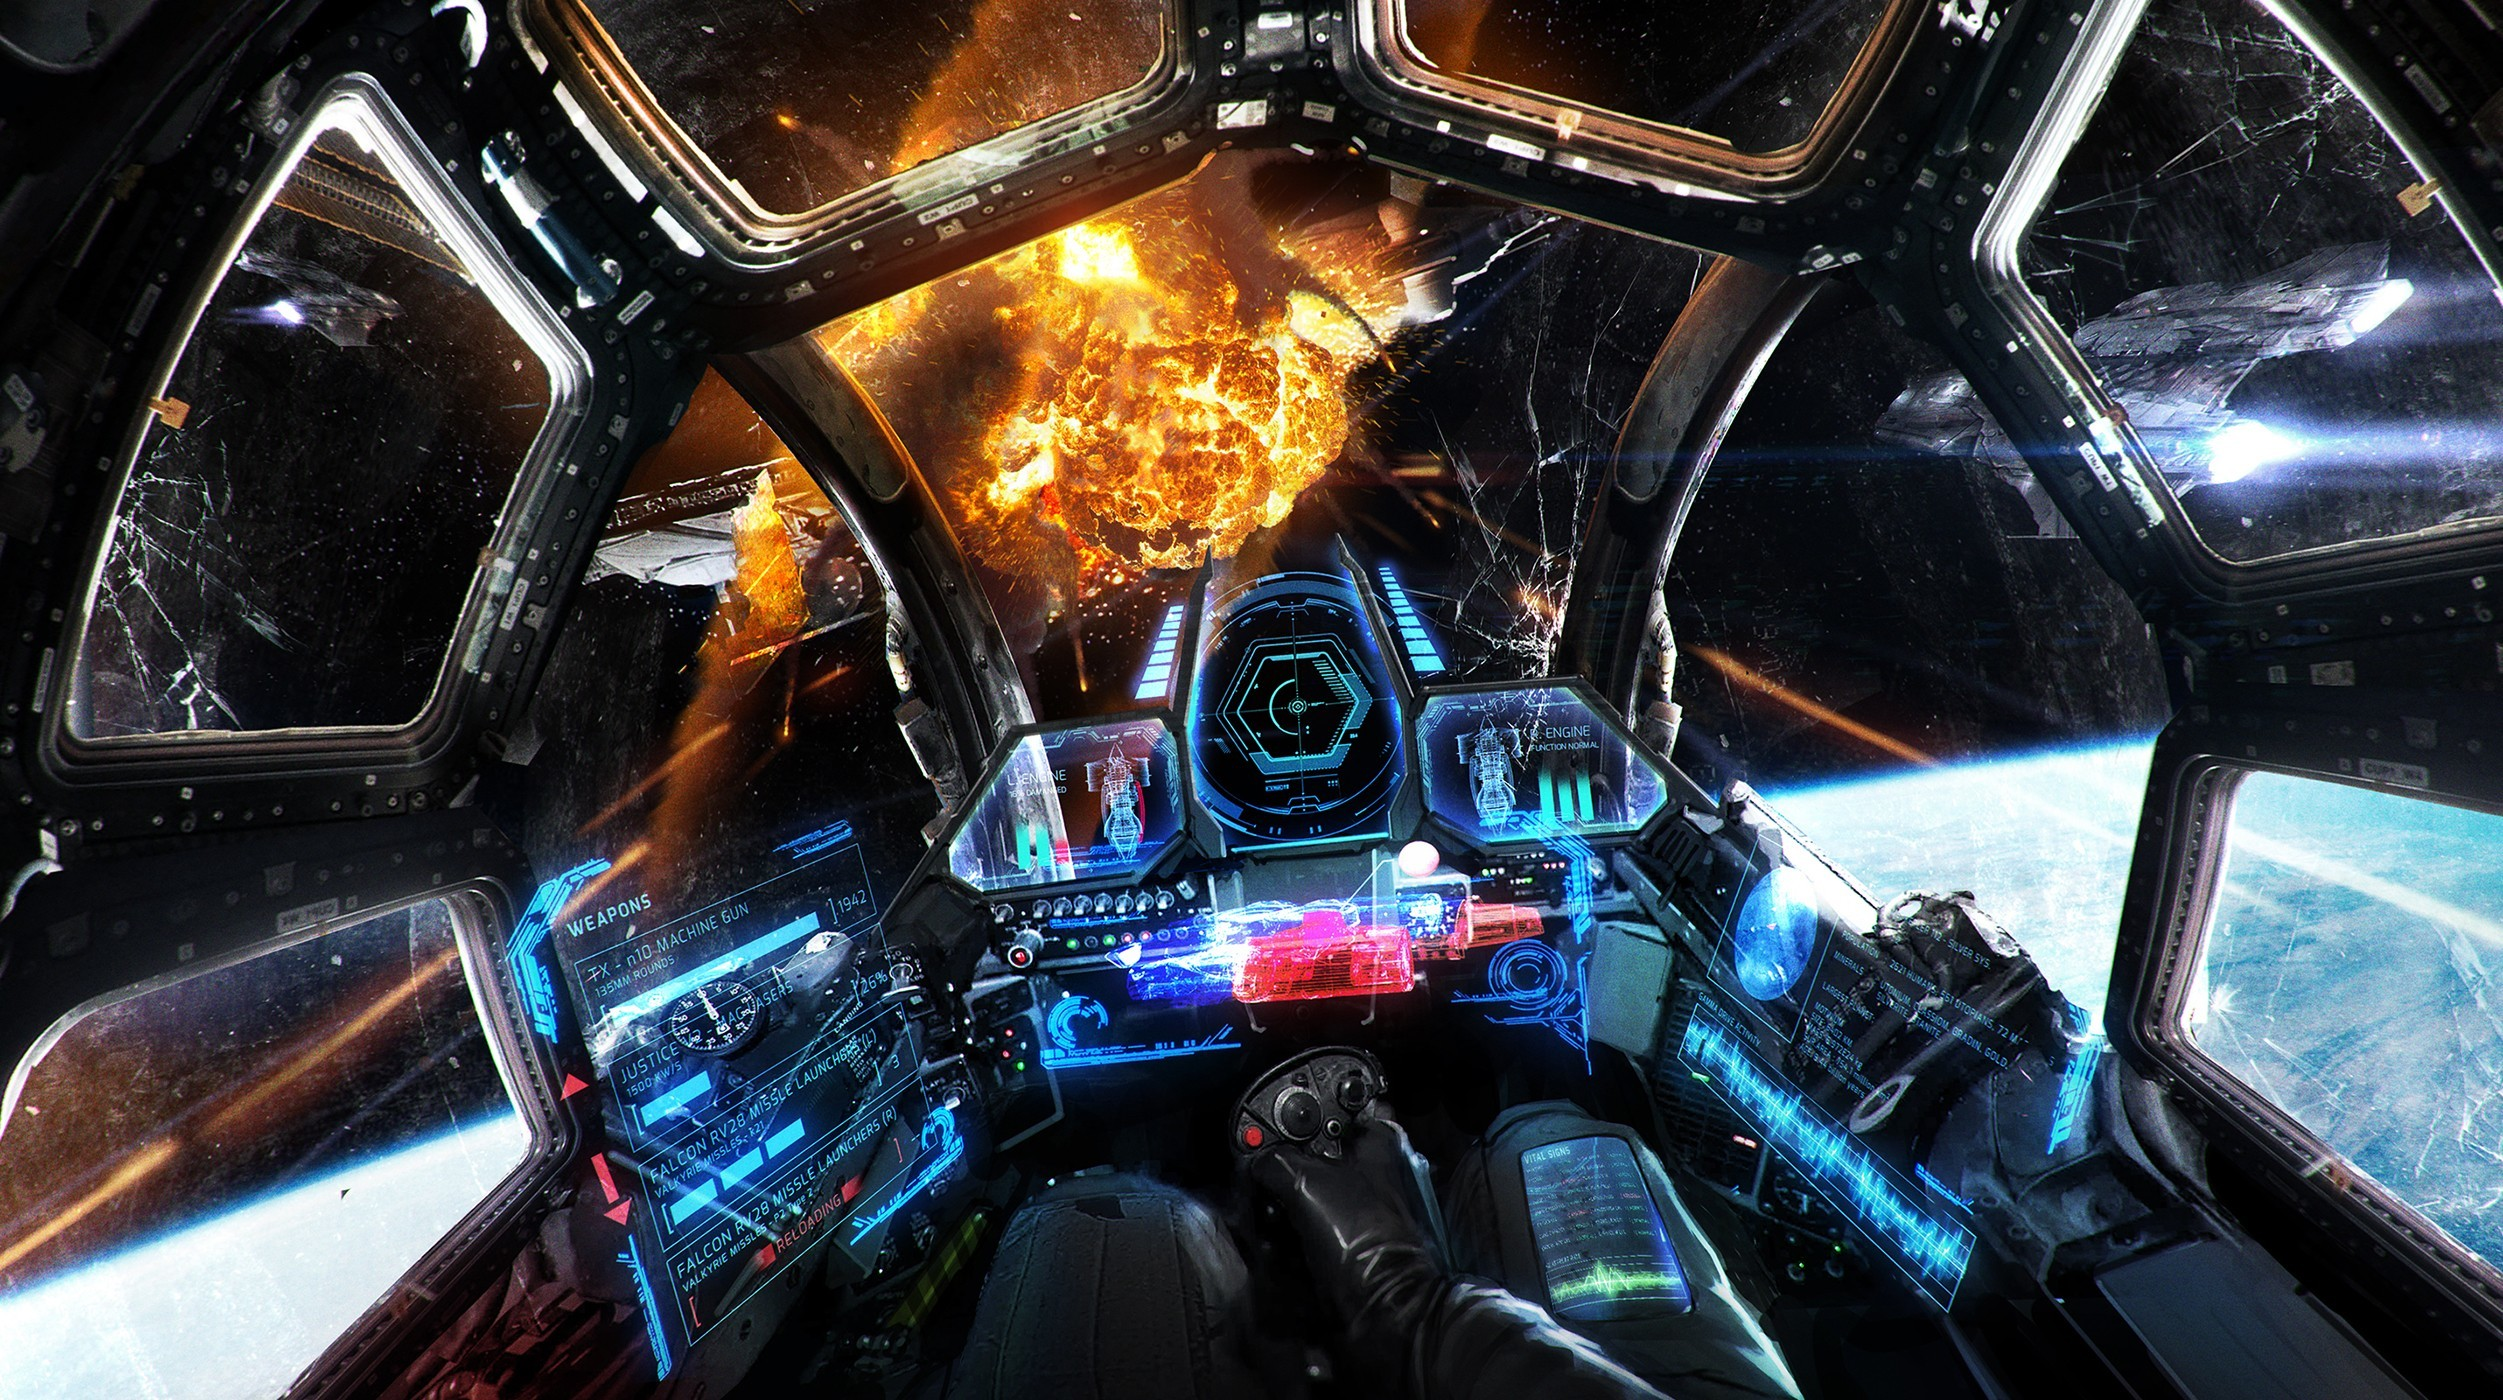 General artwork science fiction space spaceship HUD explosion  cockpit